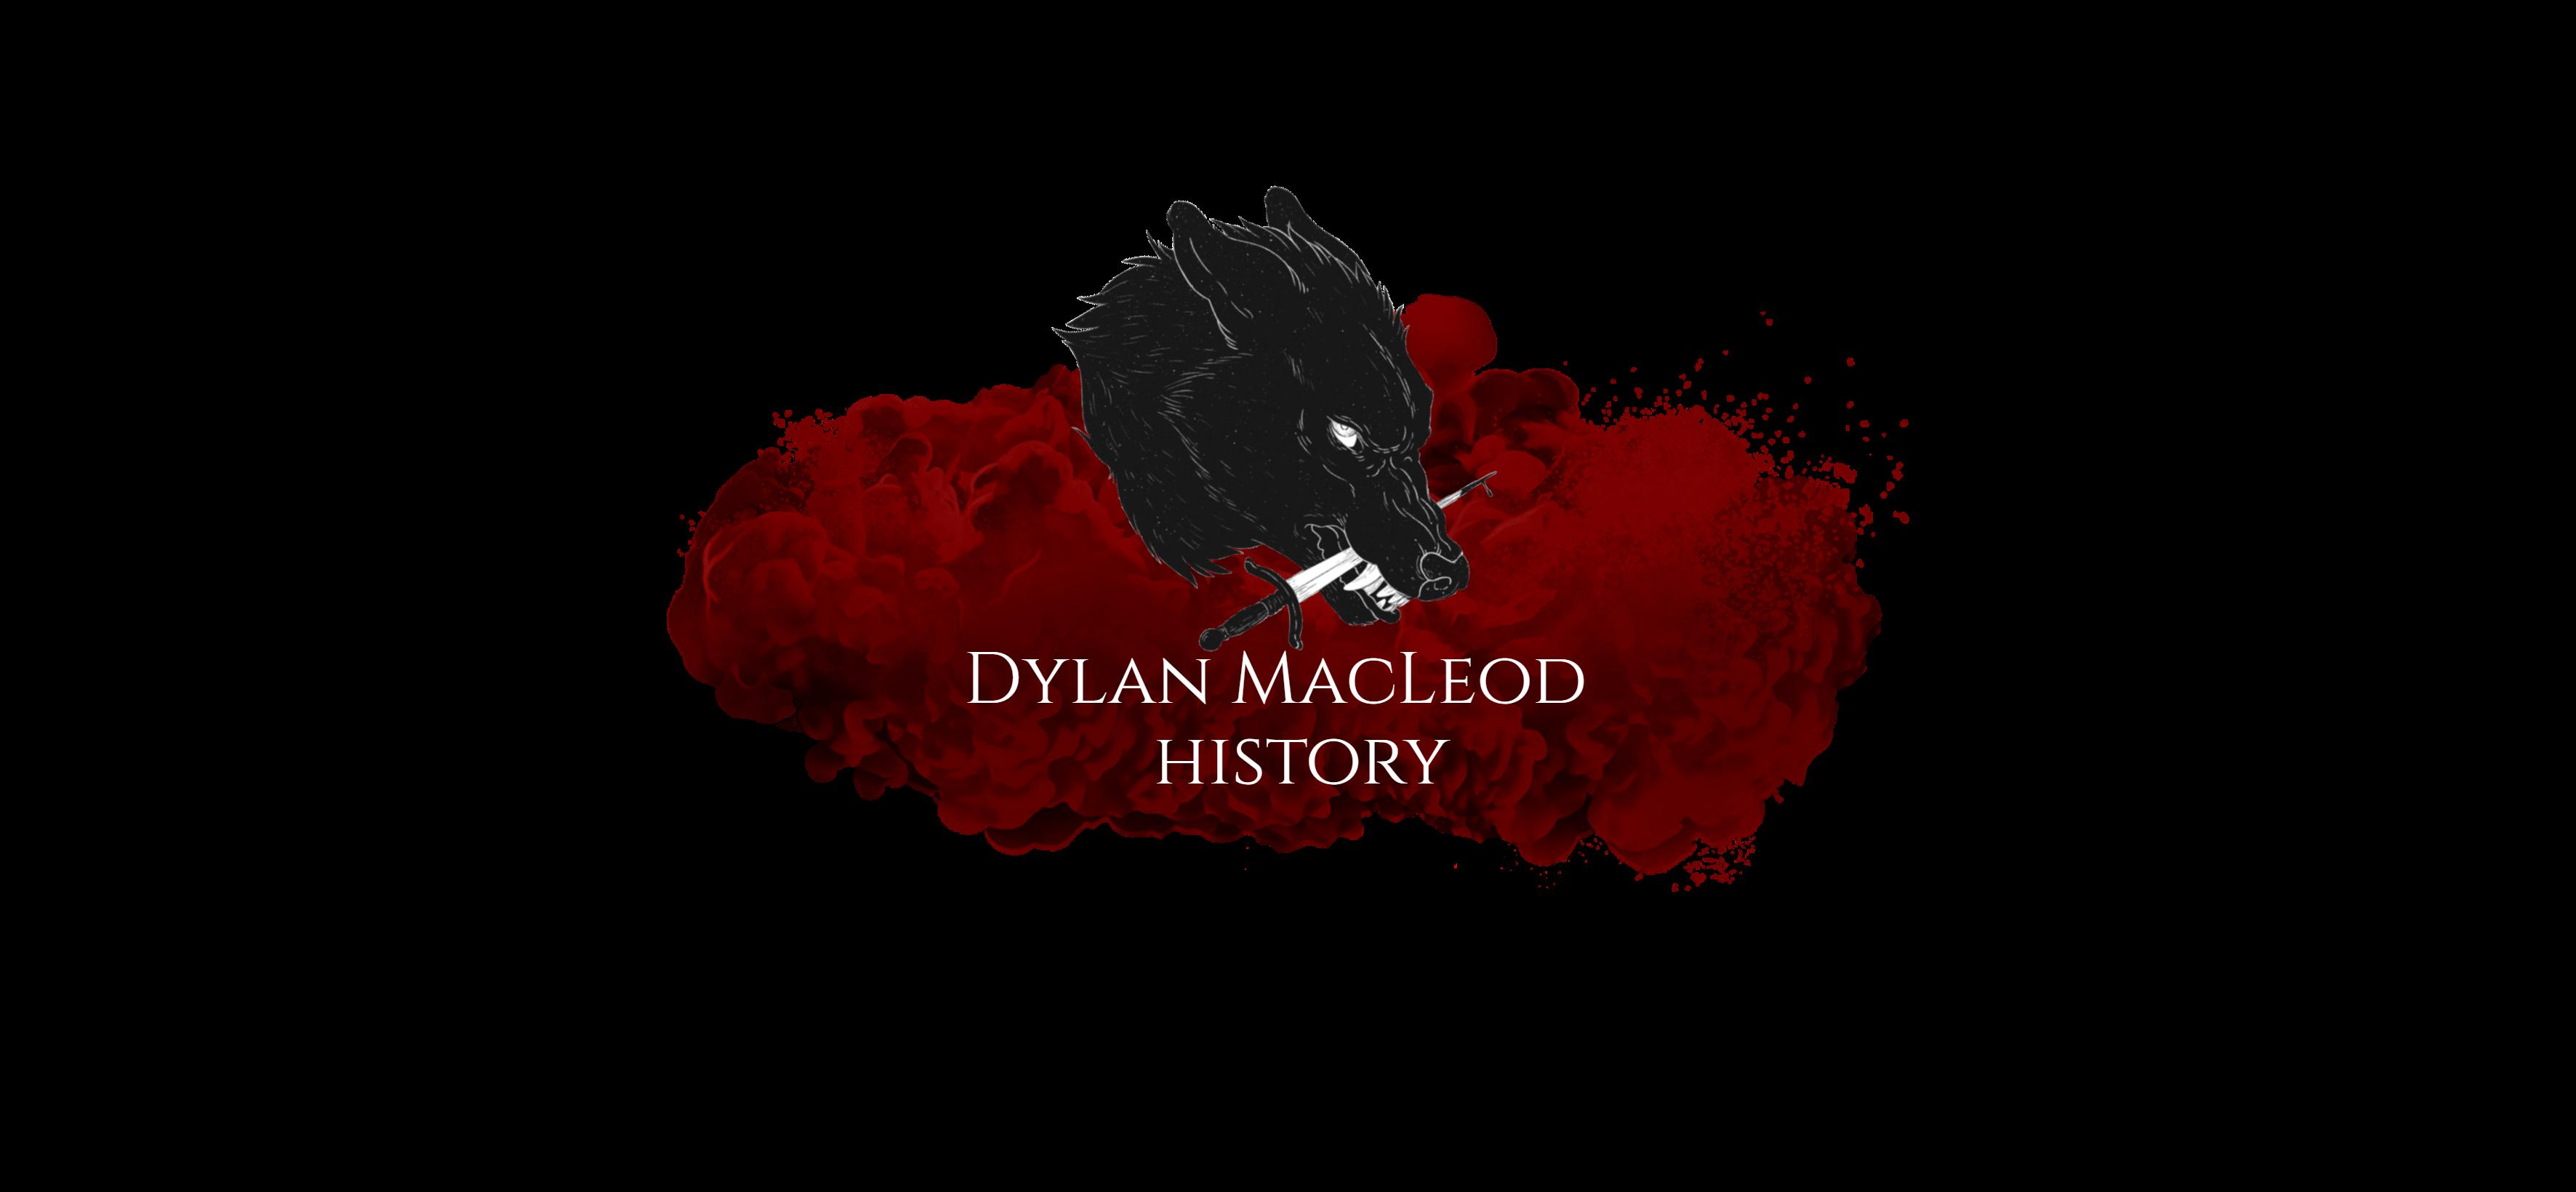 1983887712_DylanMacLeod111NEW.png.e1e59fda686a40d4eaa9a24d0280c034.png